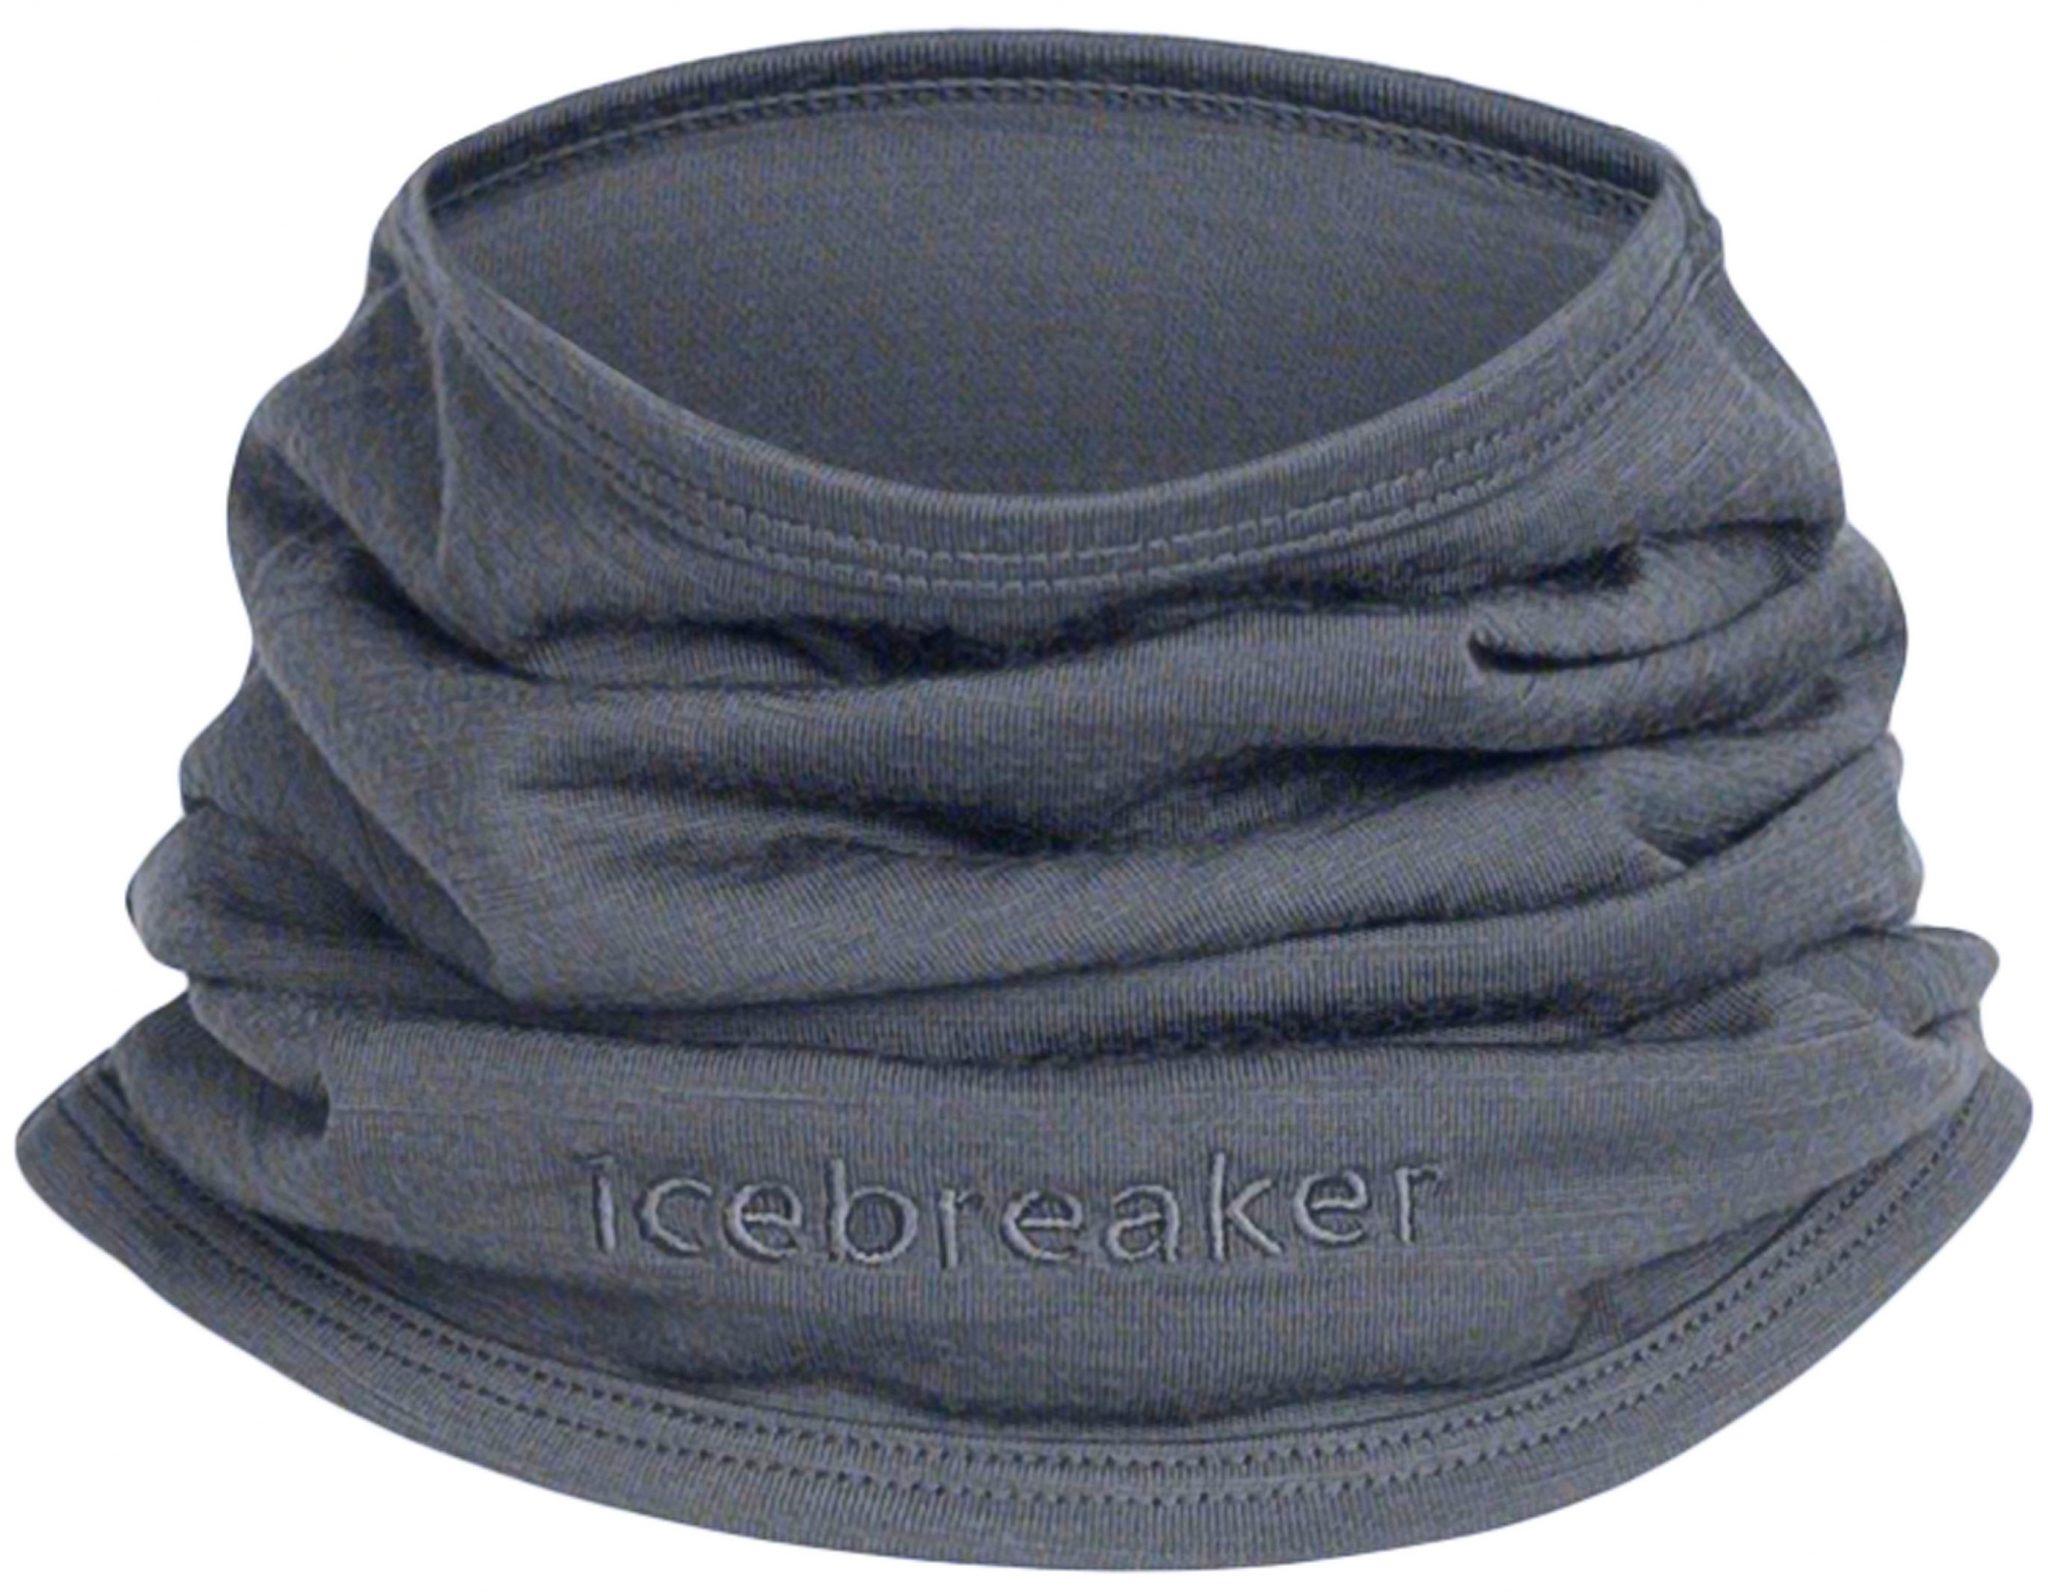 Icebreaker Accessoire »Flexi Chute«